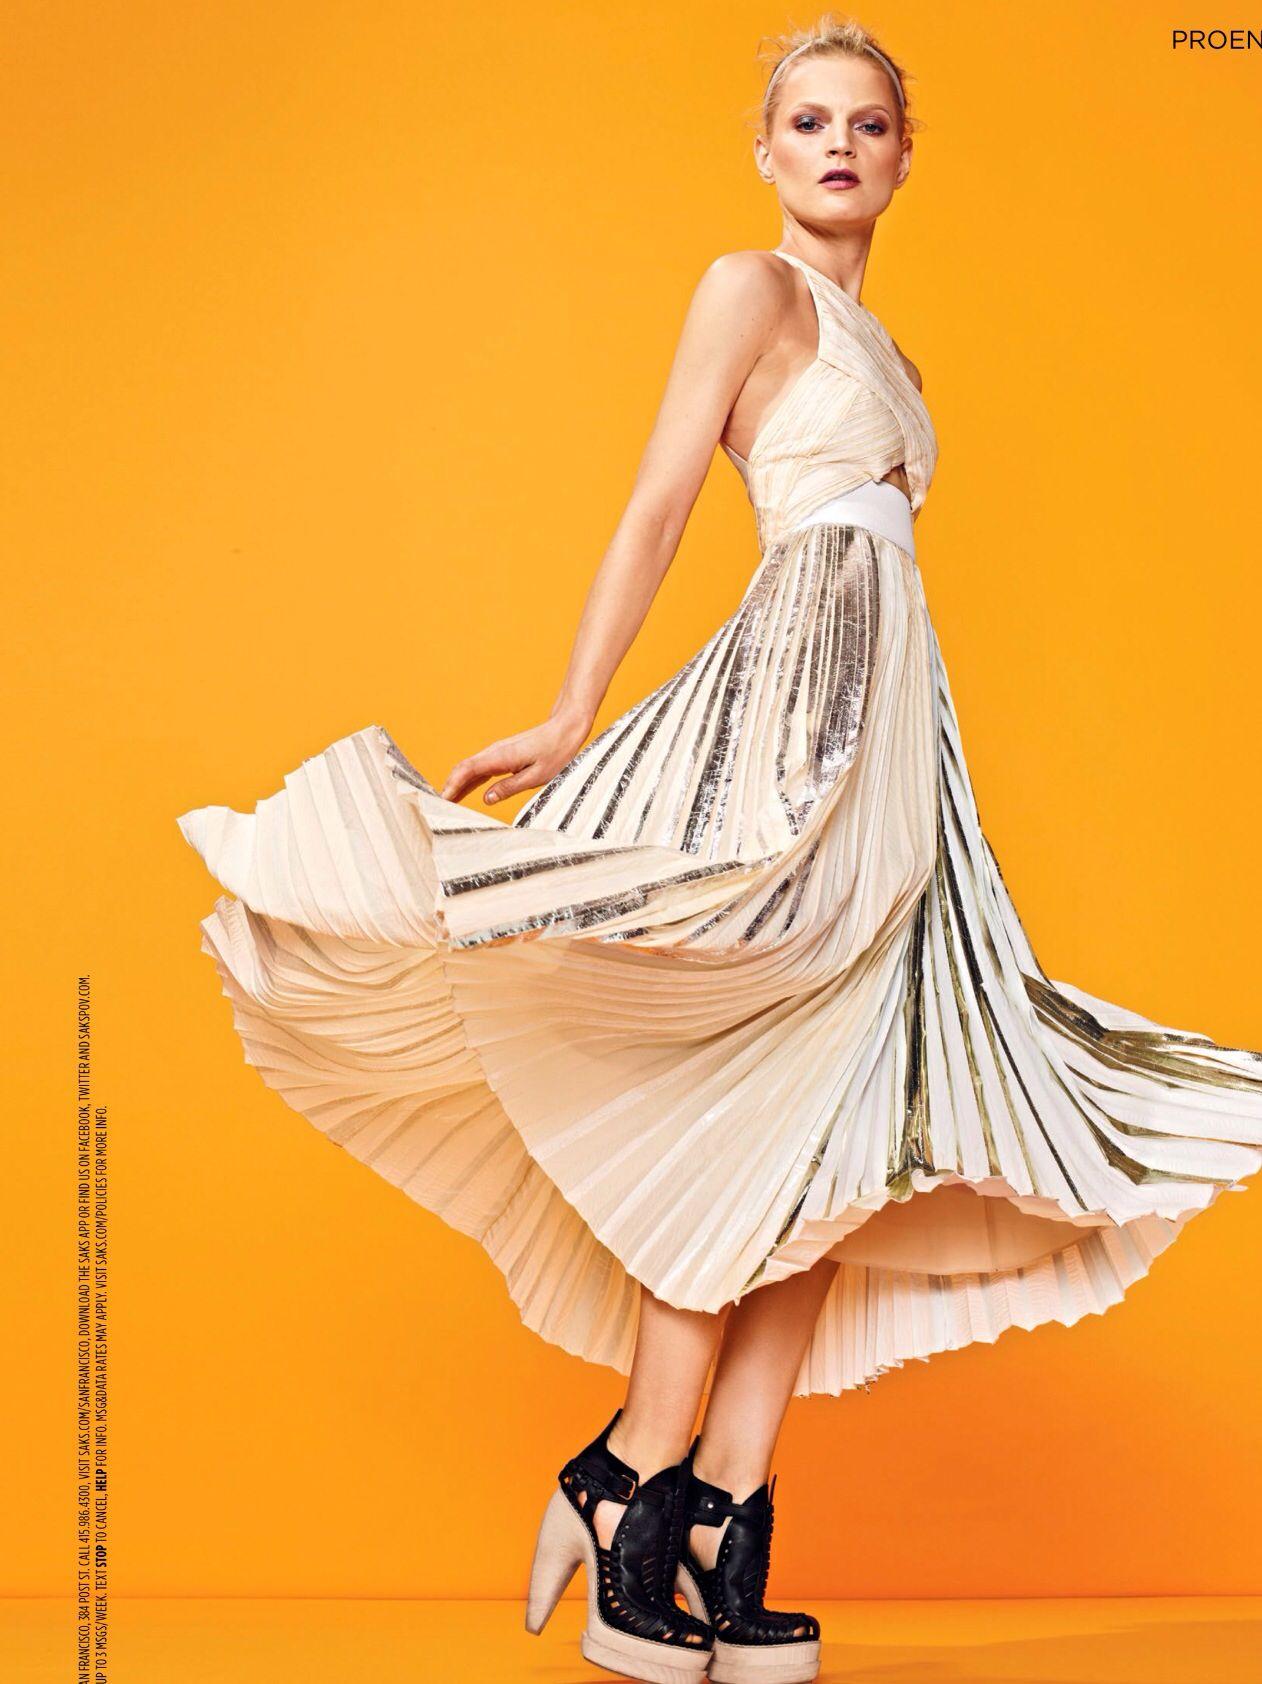 PINK 4# 80$   Formal dresses, Fashion, Prom dresses